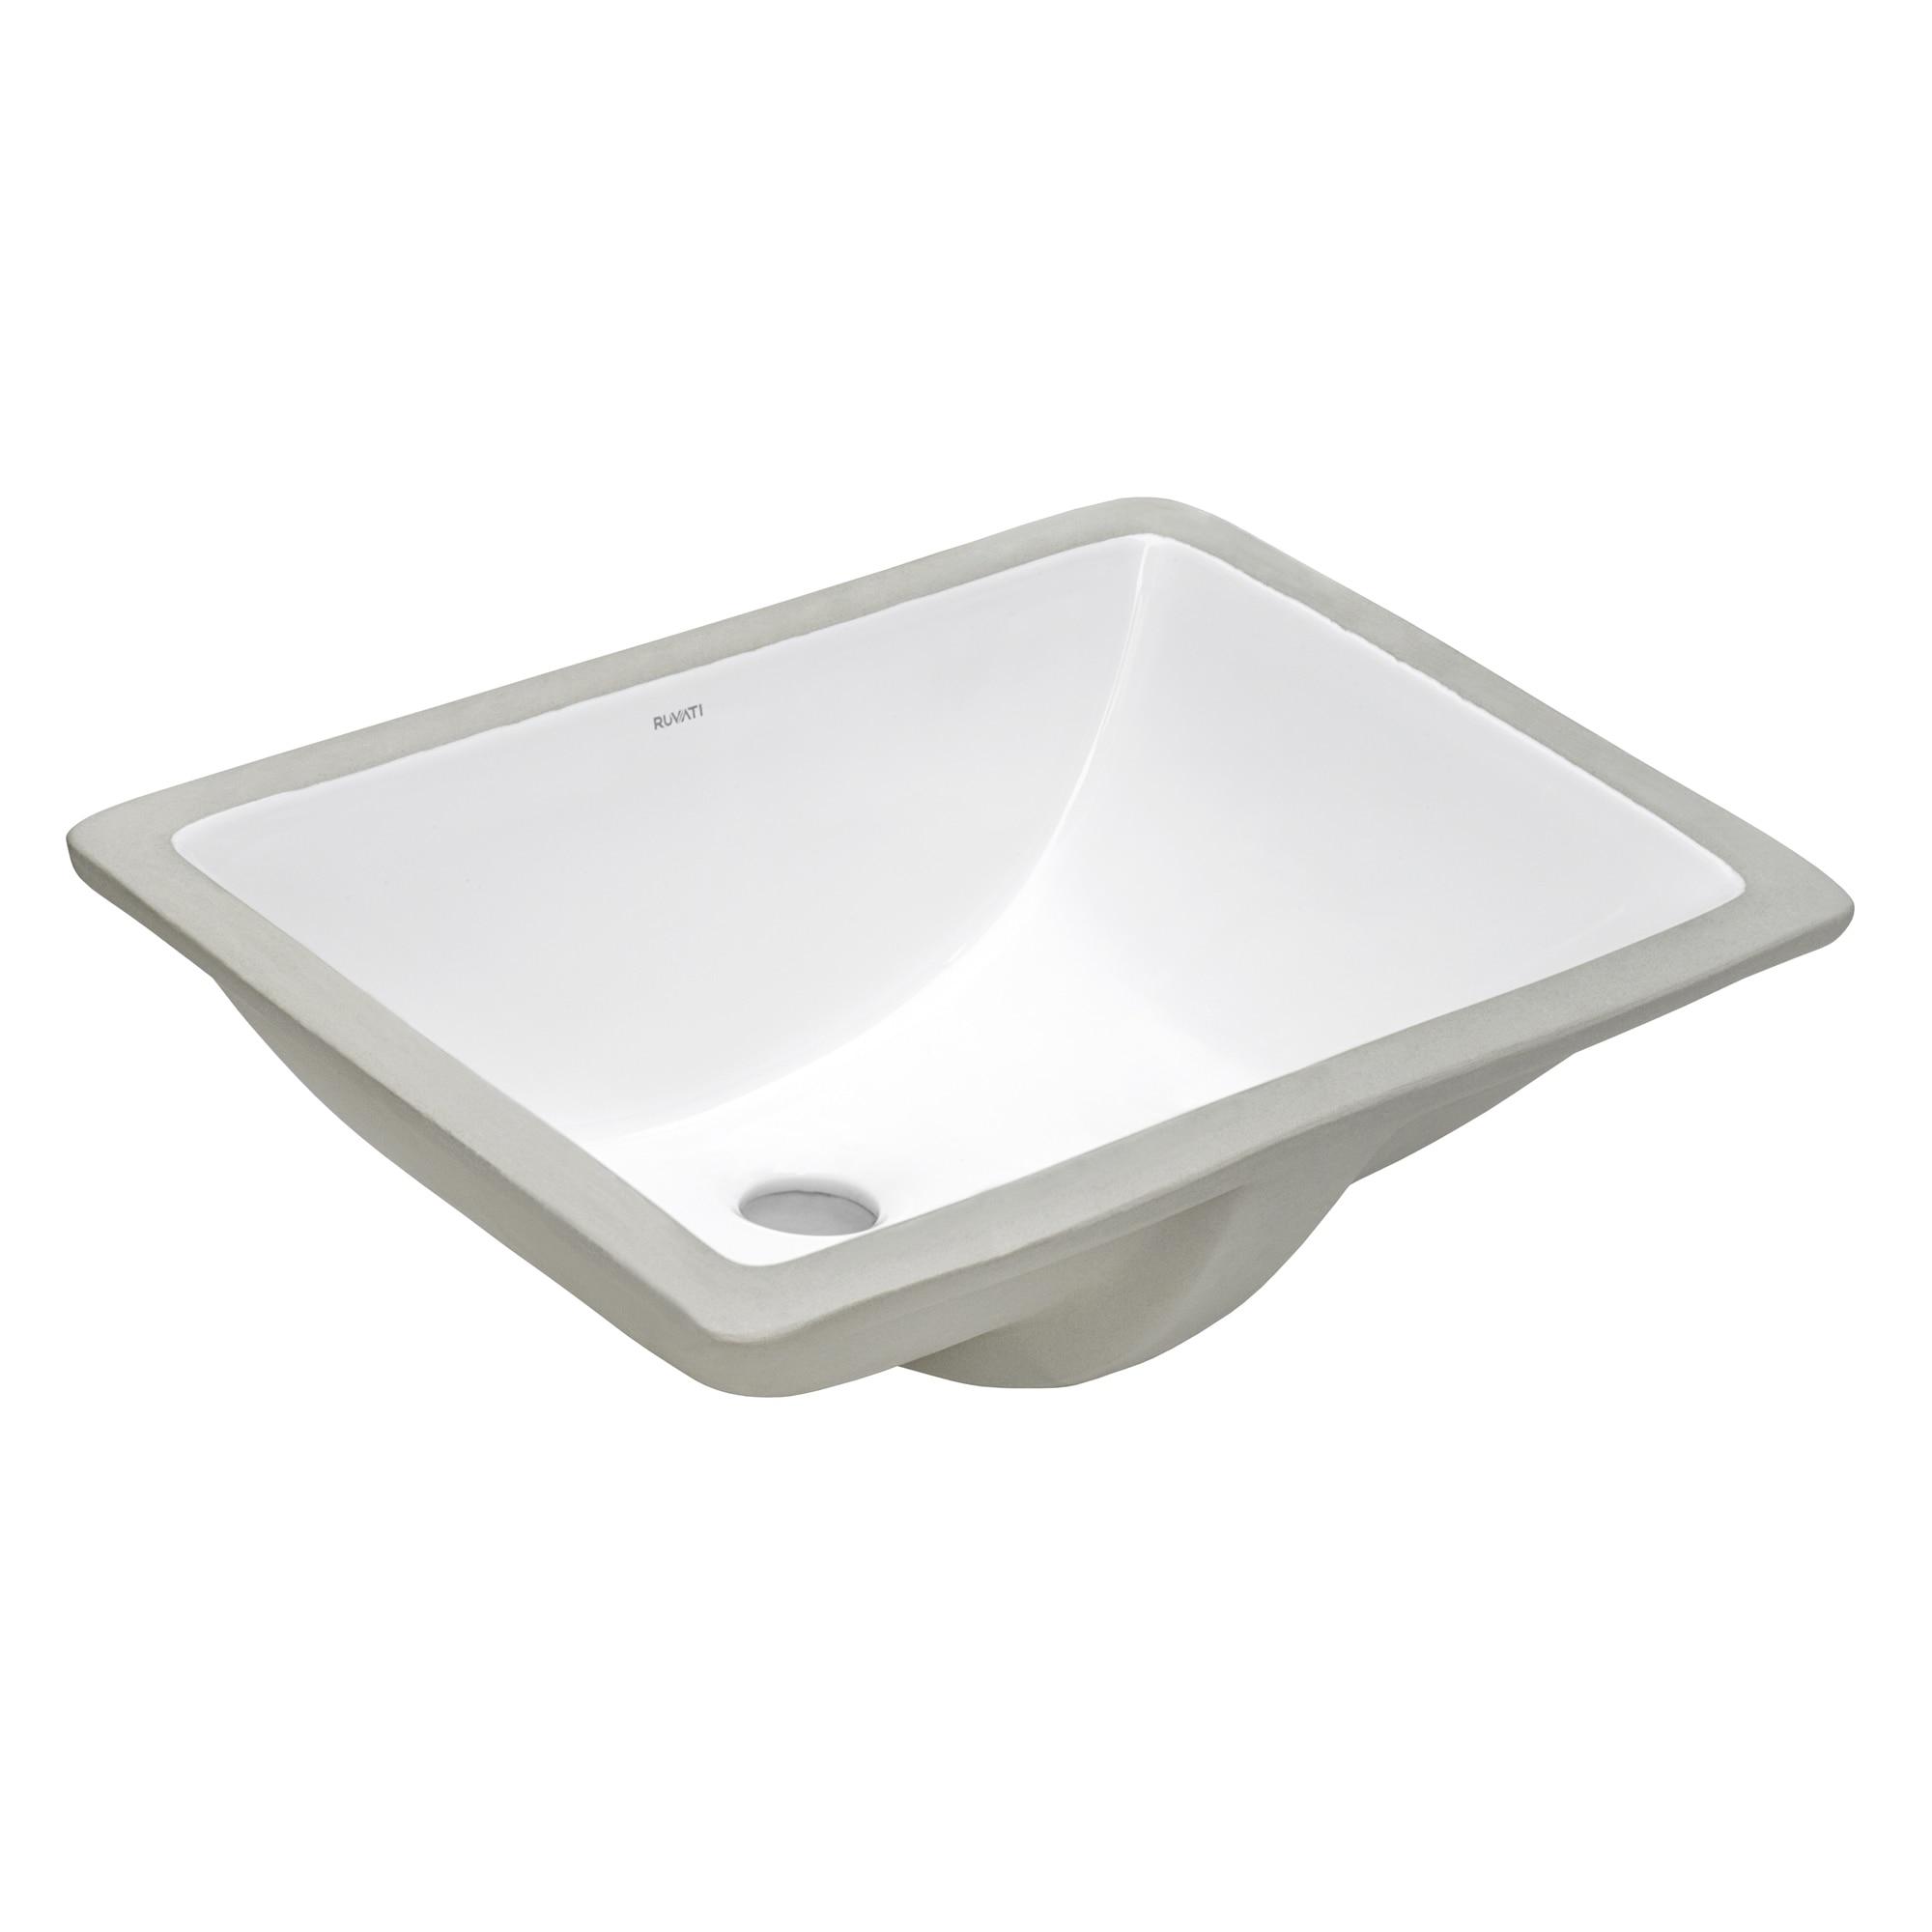 Ruvati 18 X 13 Inch Undermount Bathroom Vanity Sink White Rectangular Porcelain Ceramic With Overflow Rvb0718 Overstock 32324946